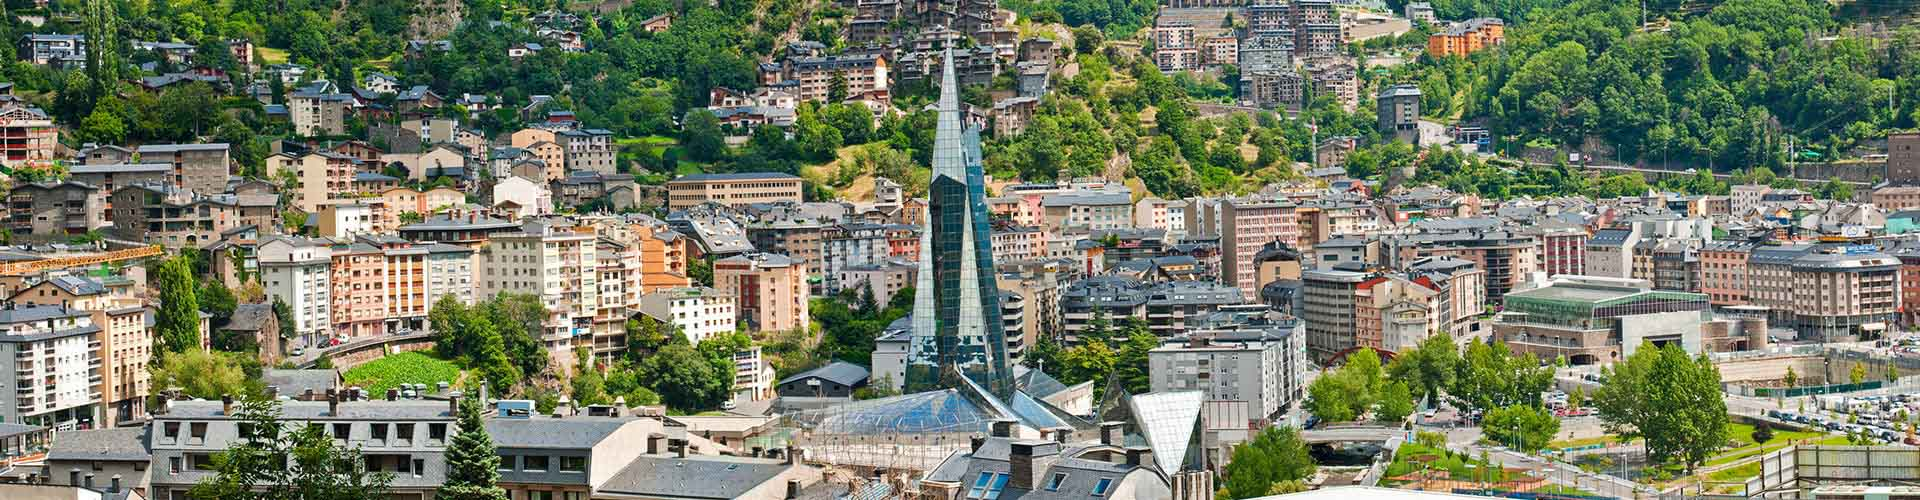 Andorra la Vella - Pokoje w mieście Andorra la Vella, Mapy miasta Andorra la Vella, Zdjęcia i Recenzje dla każdego pokoju w mieście Andorra la Vella.